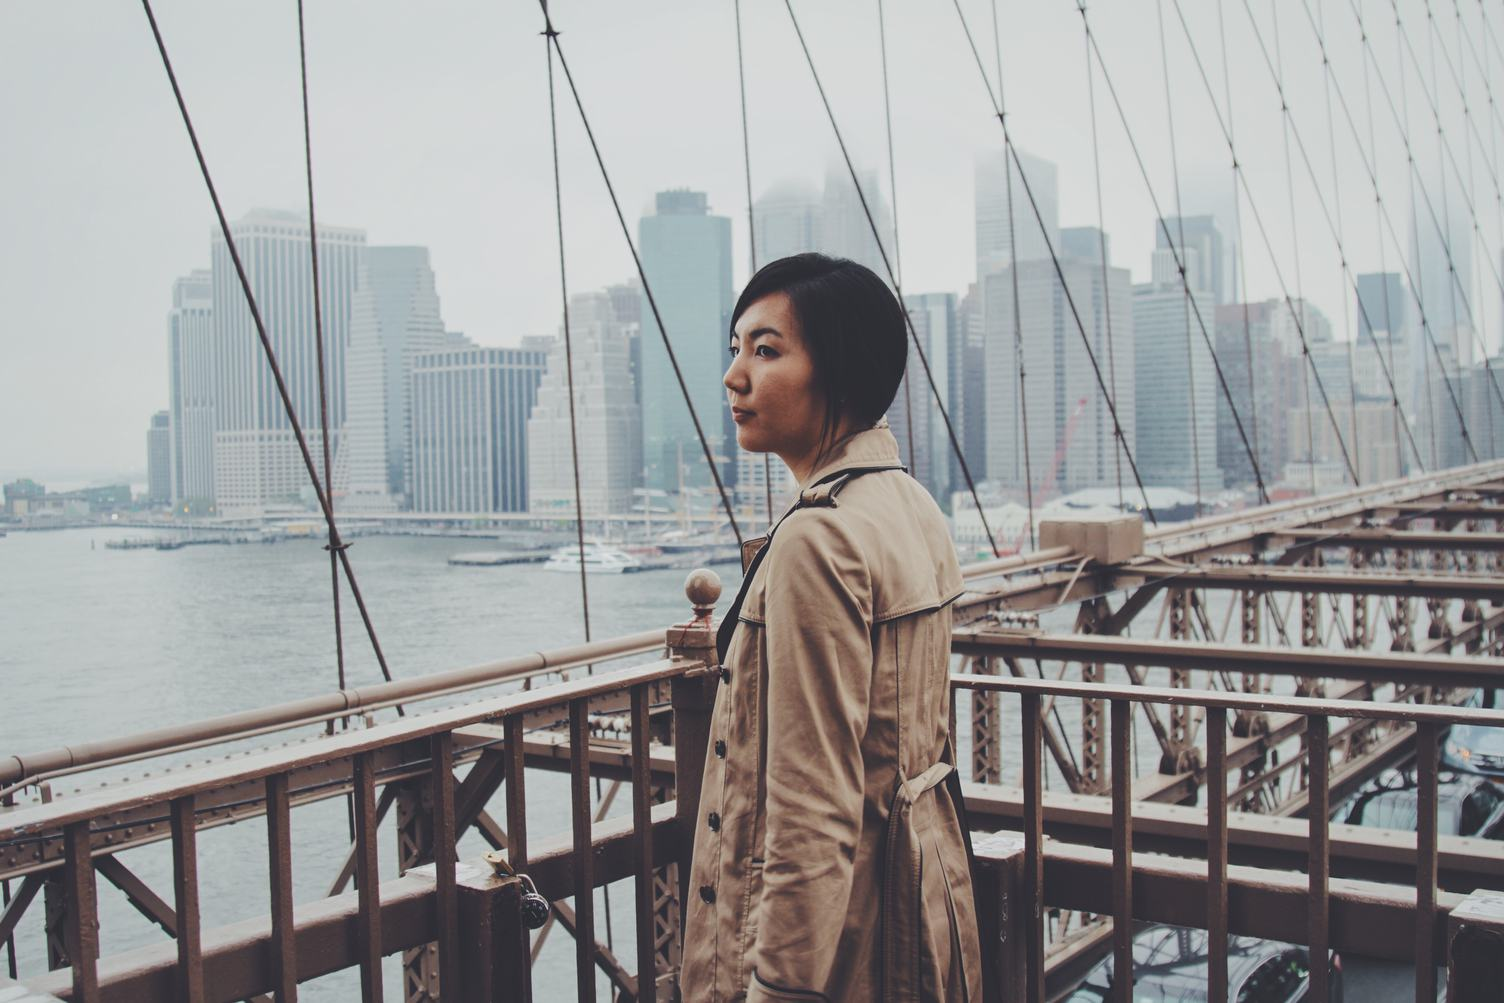 Woman wearing a Trench Coat standing on Brooklyn Bridge, New York